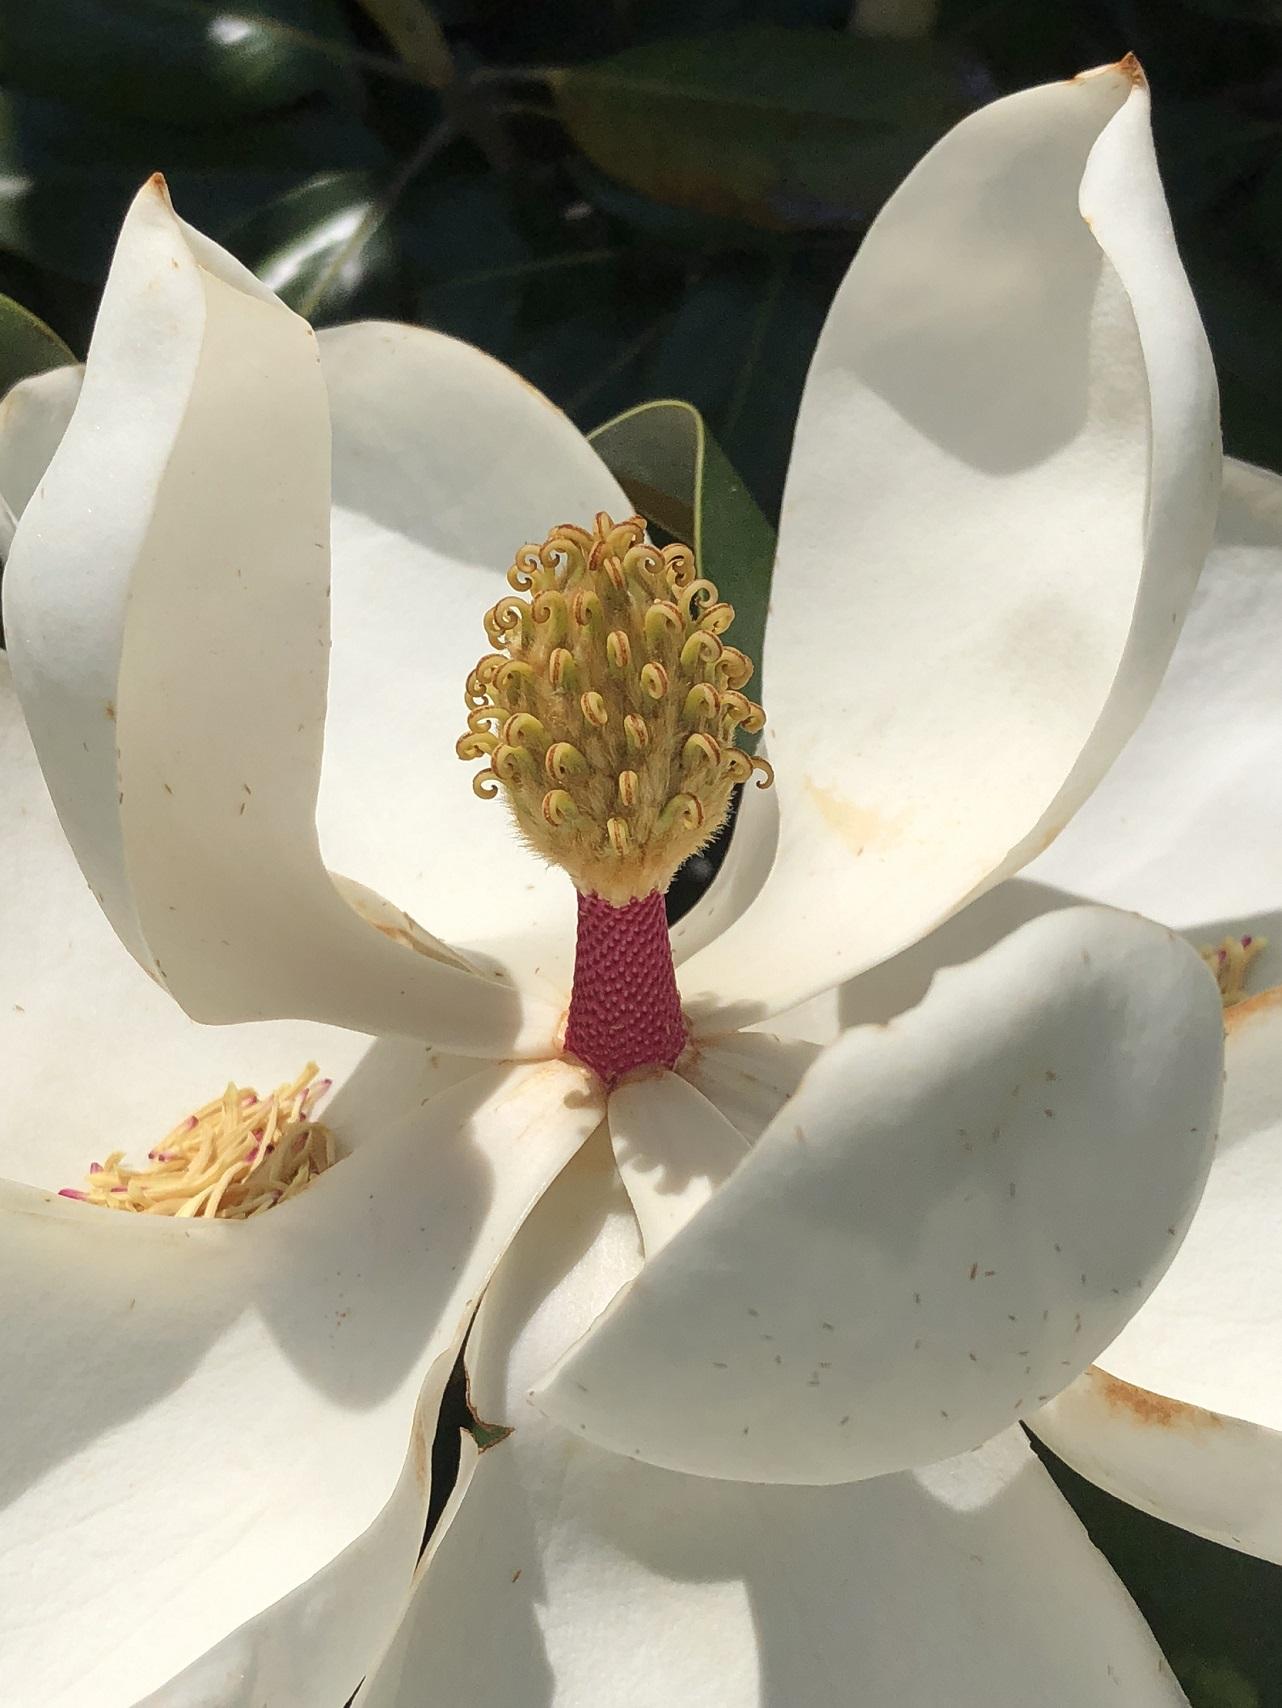 00s Magnolia Blossom